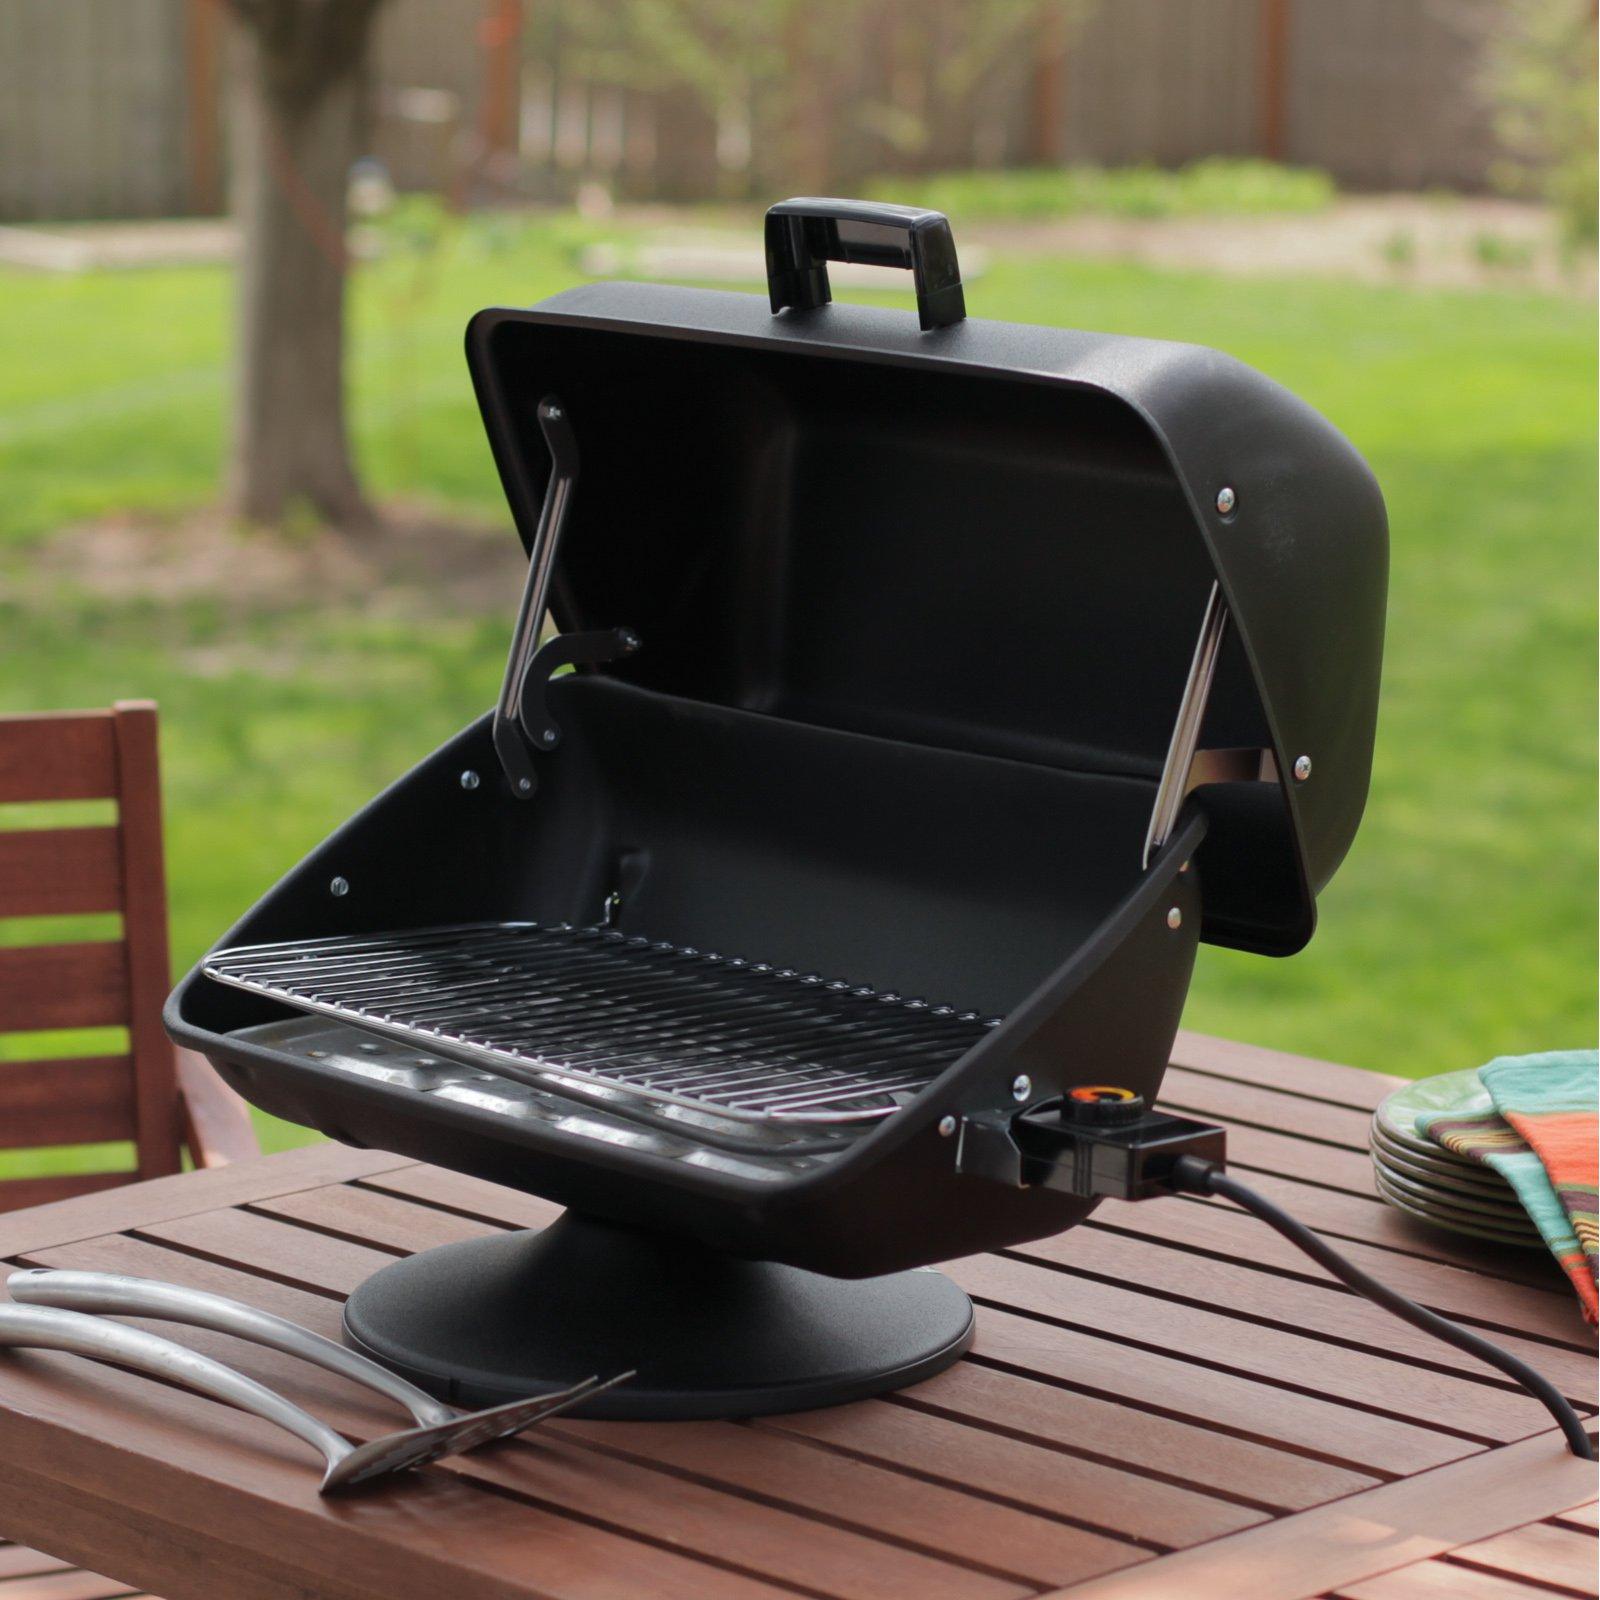 Meco easy street 1500 watt apartment condo backyard rv electric table top outdoor bbq grill walmart com